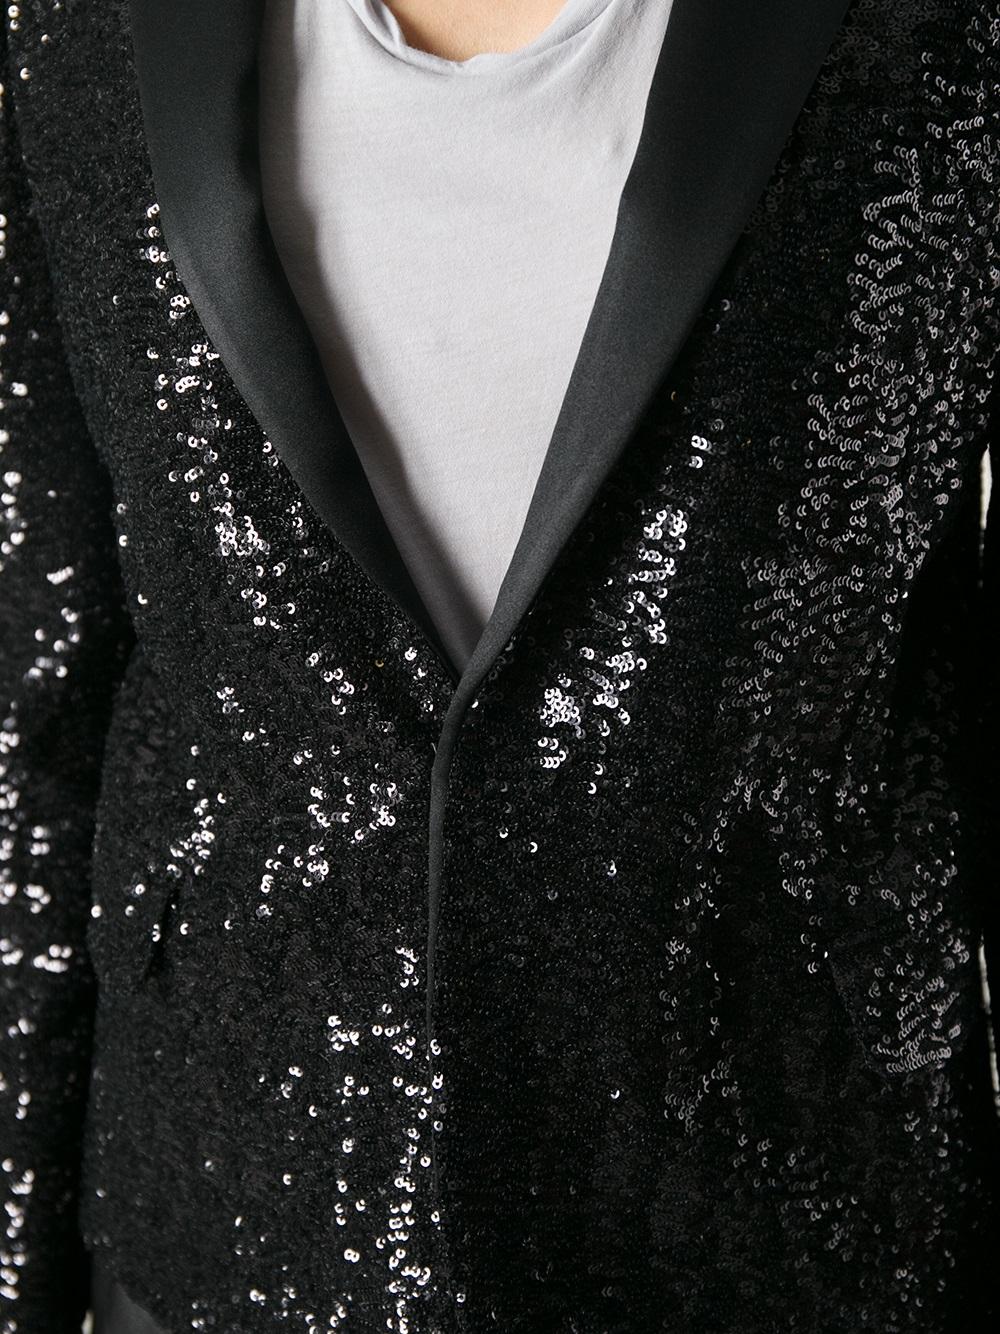 19fd283672a Saint Laurent Sequined Blazer in Black - Lyst